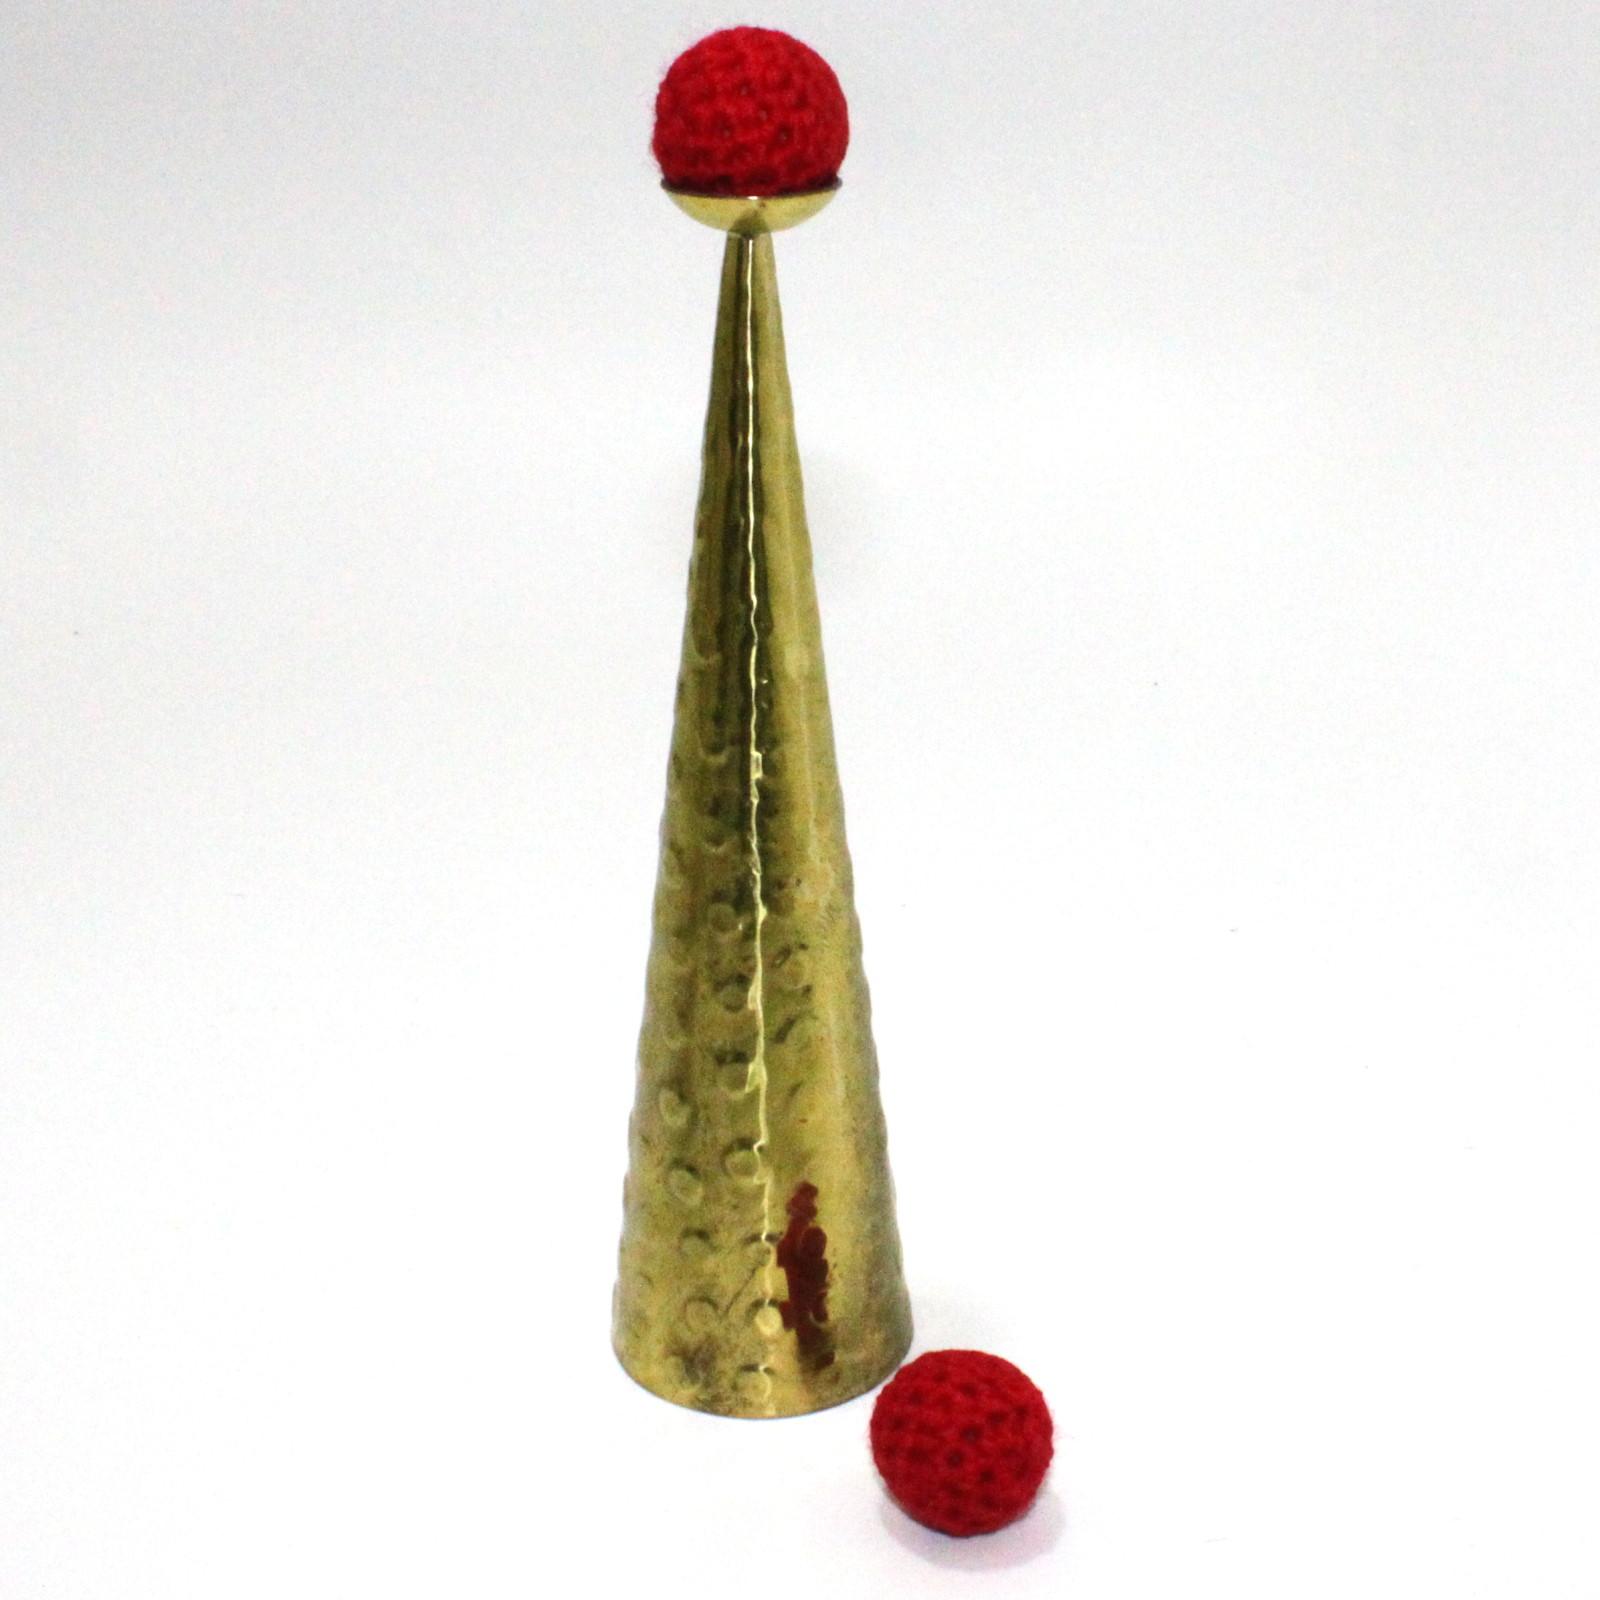 Caliph's Cone by Viking Mfg.